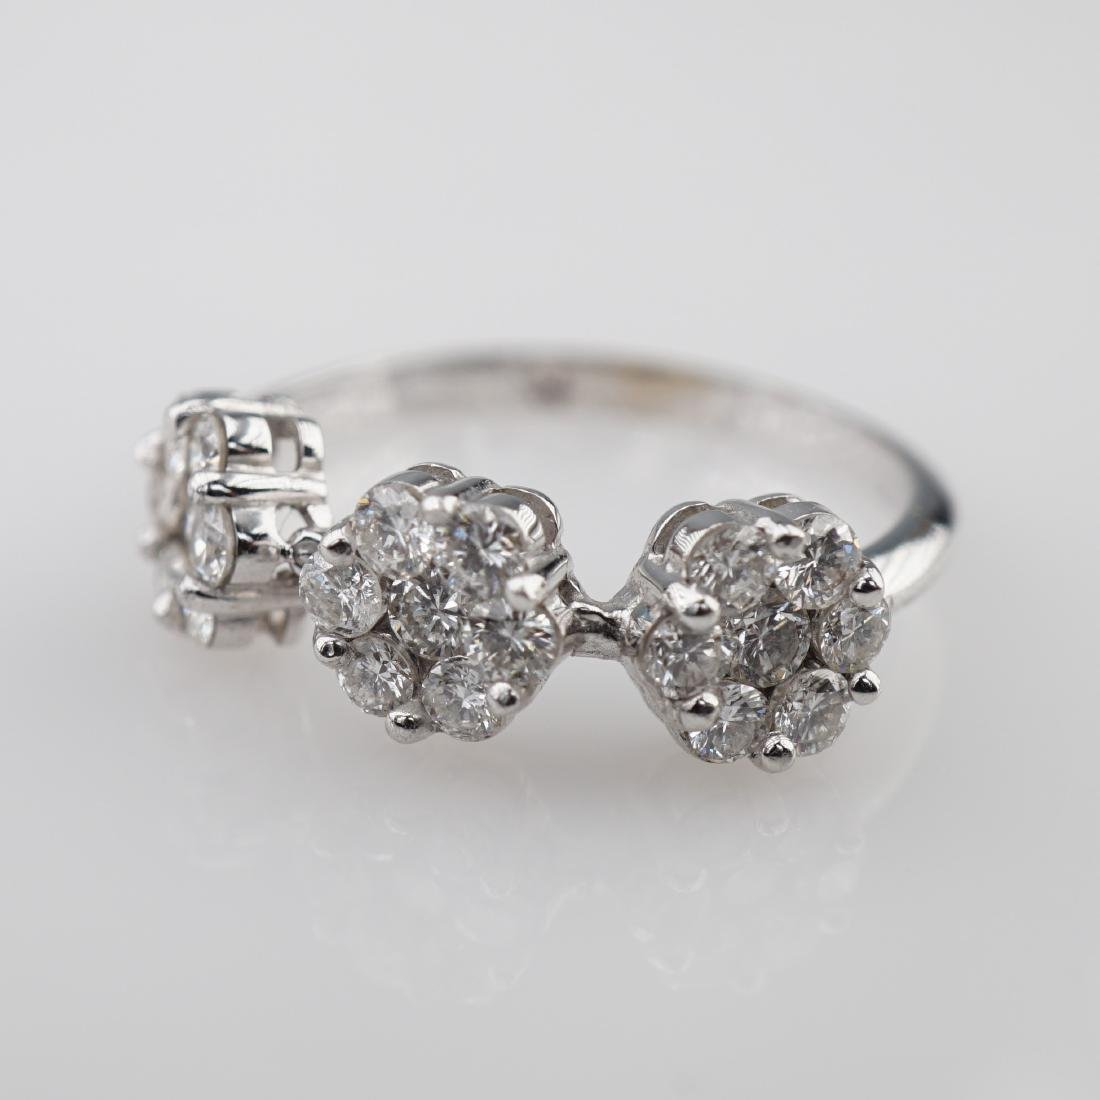 14k YG 1ct White Diamond E-F Color Ring sz 6.75